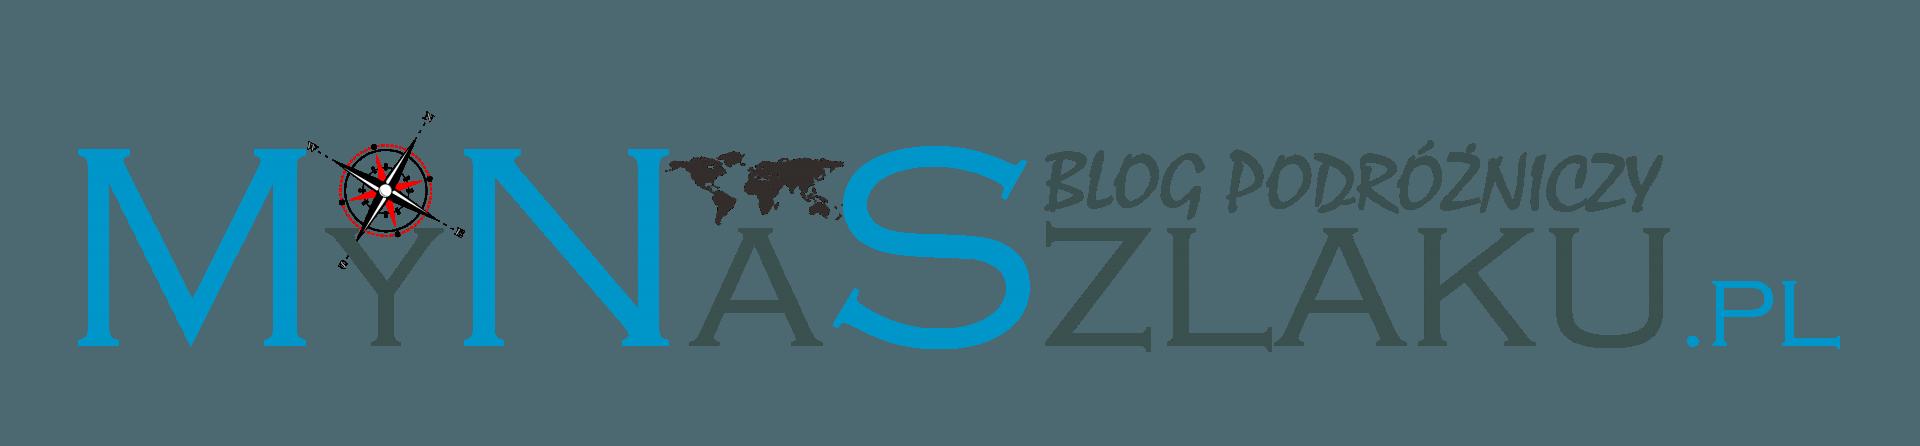 Szlak długodystansowy Brzeźnica – Łopuszna, etap 3: Jordanów – Rabka-Zdrój